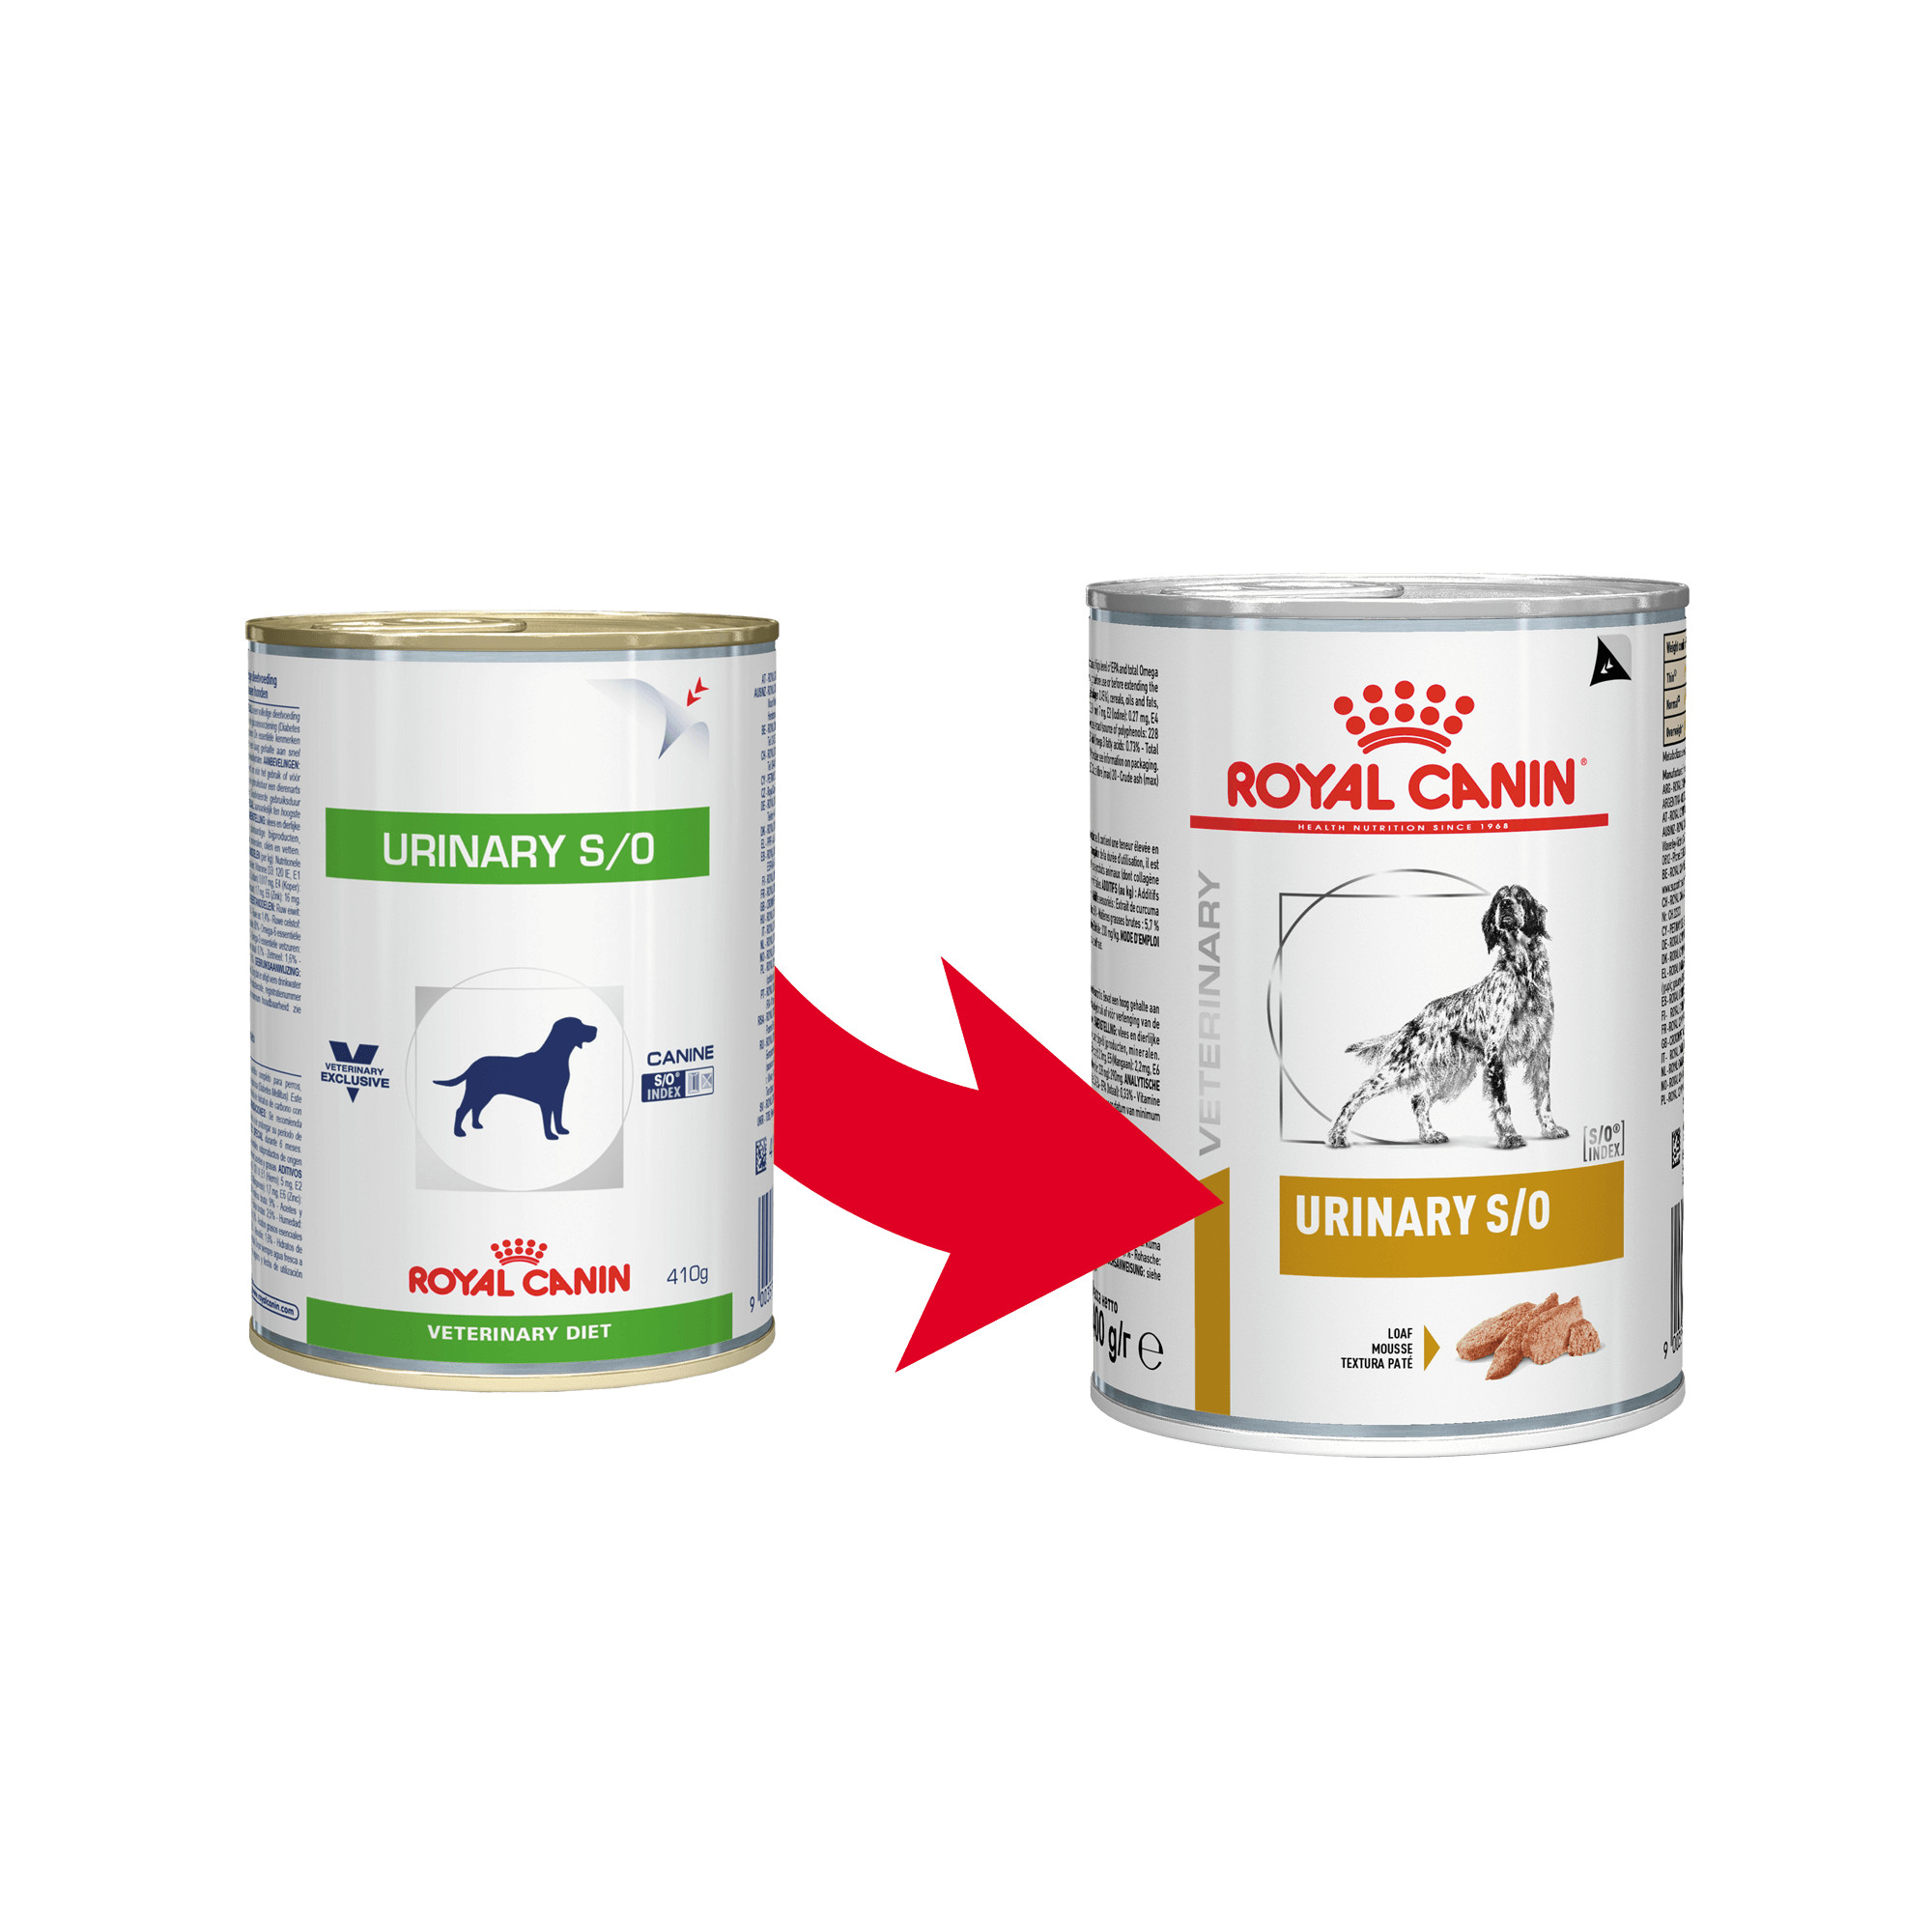 Royal Canin Veterinary Urinary S/O Hundefutter (Dosen) 410g